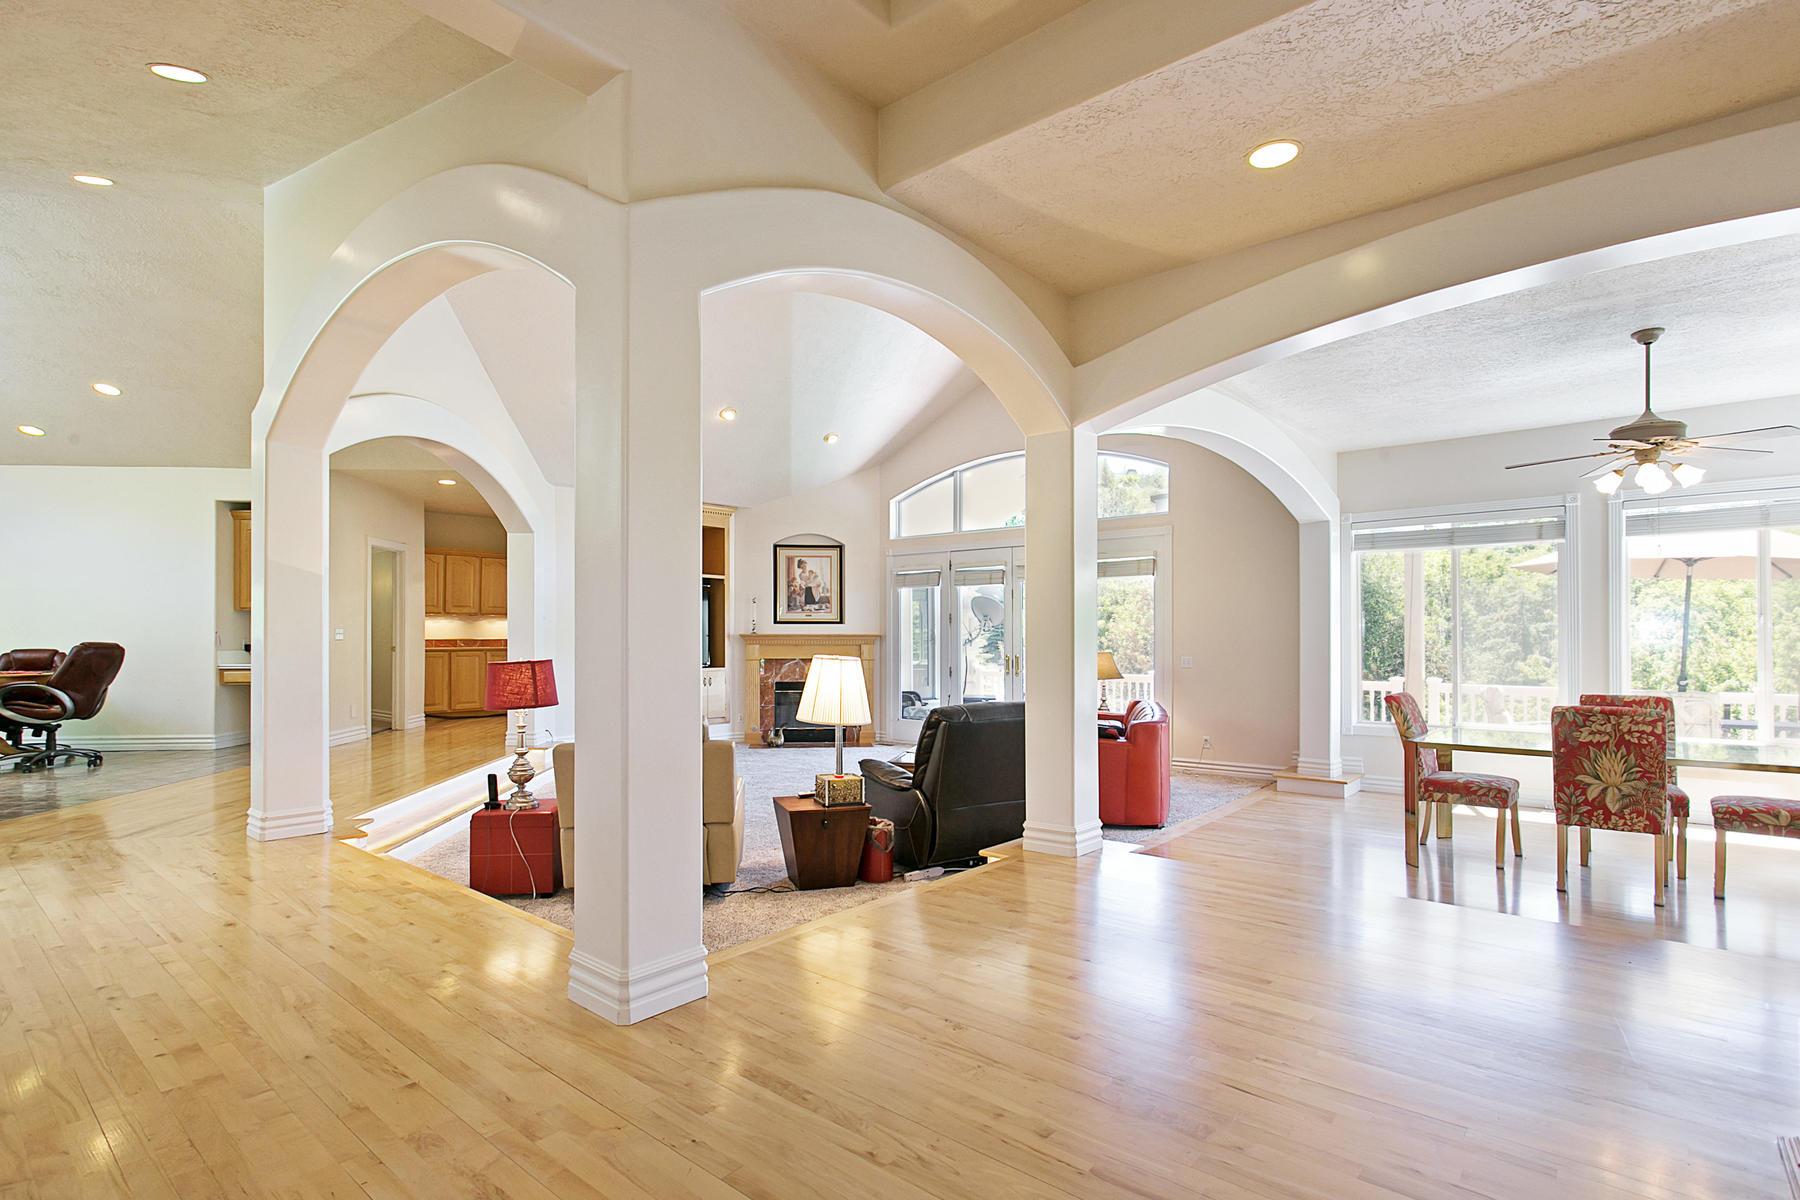 Villa per Vendita alle ore Emigration Canyon Retreat 730 N Emigration Estates Rd Salt Lake City, Utah, 84108 Stati Uniti